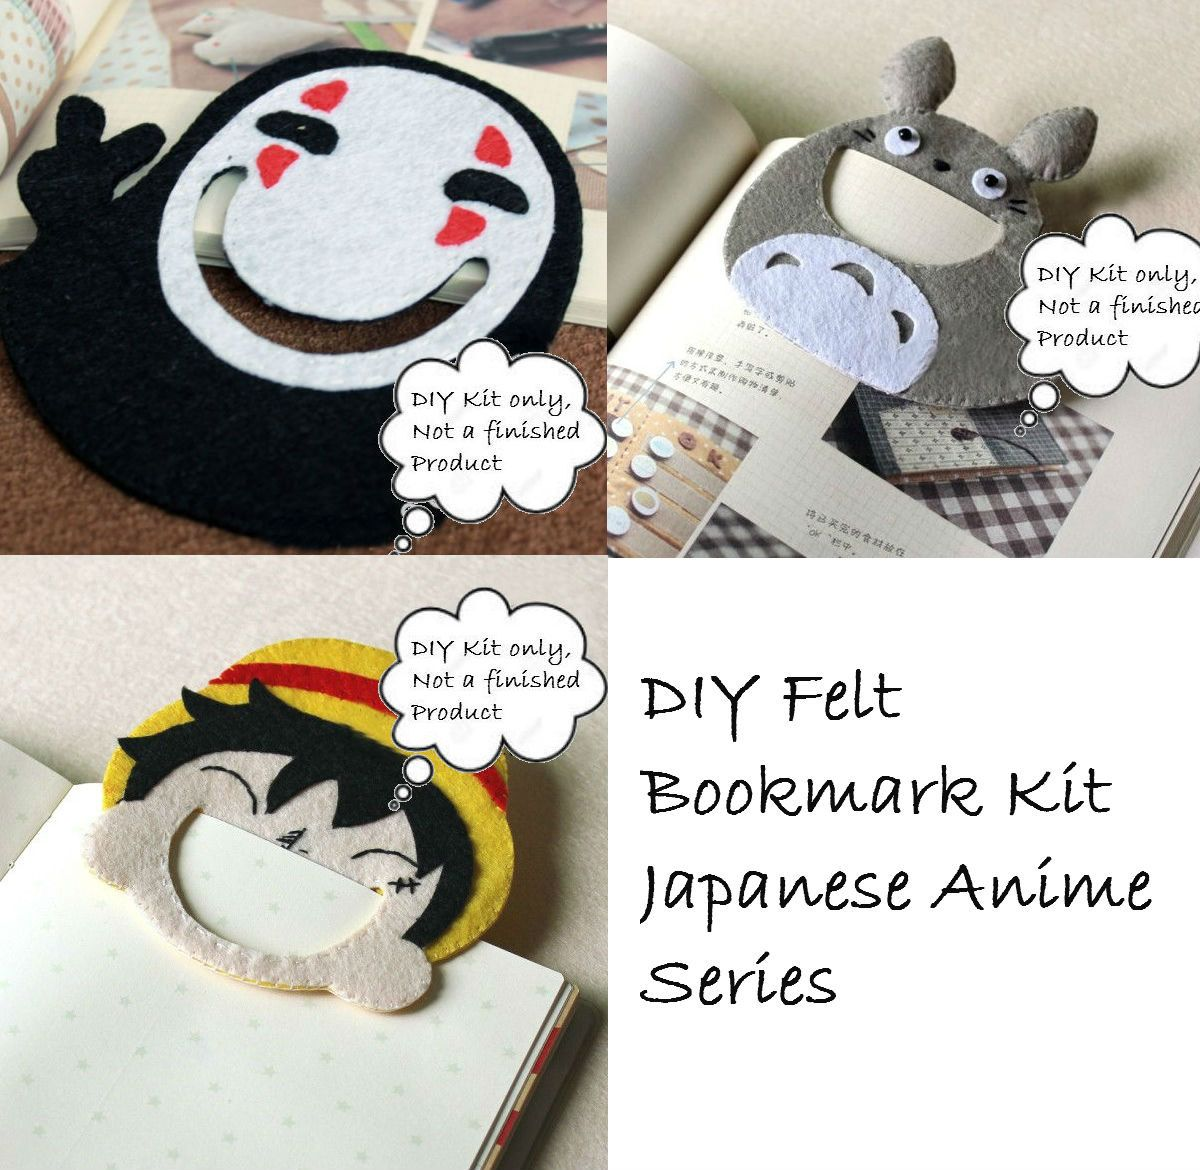 Totoro Spirited Away DIY Felt Kit DIY Bookmark Kit